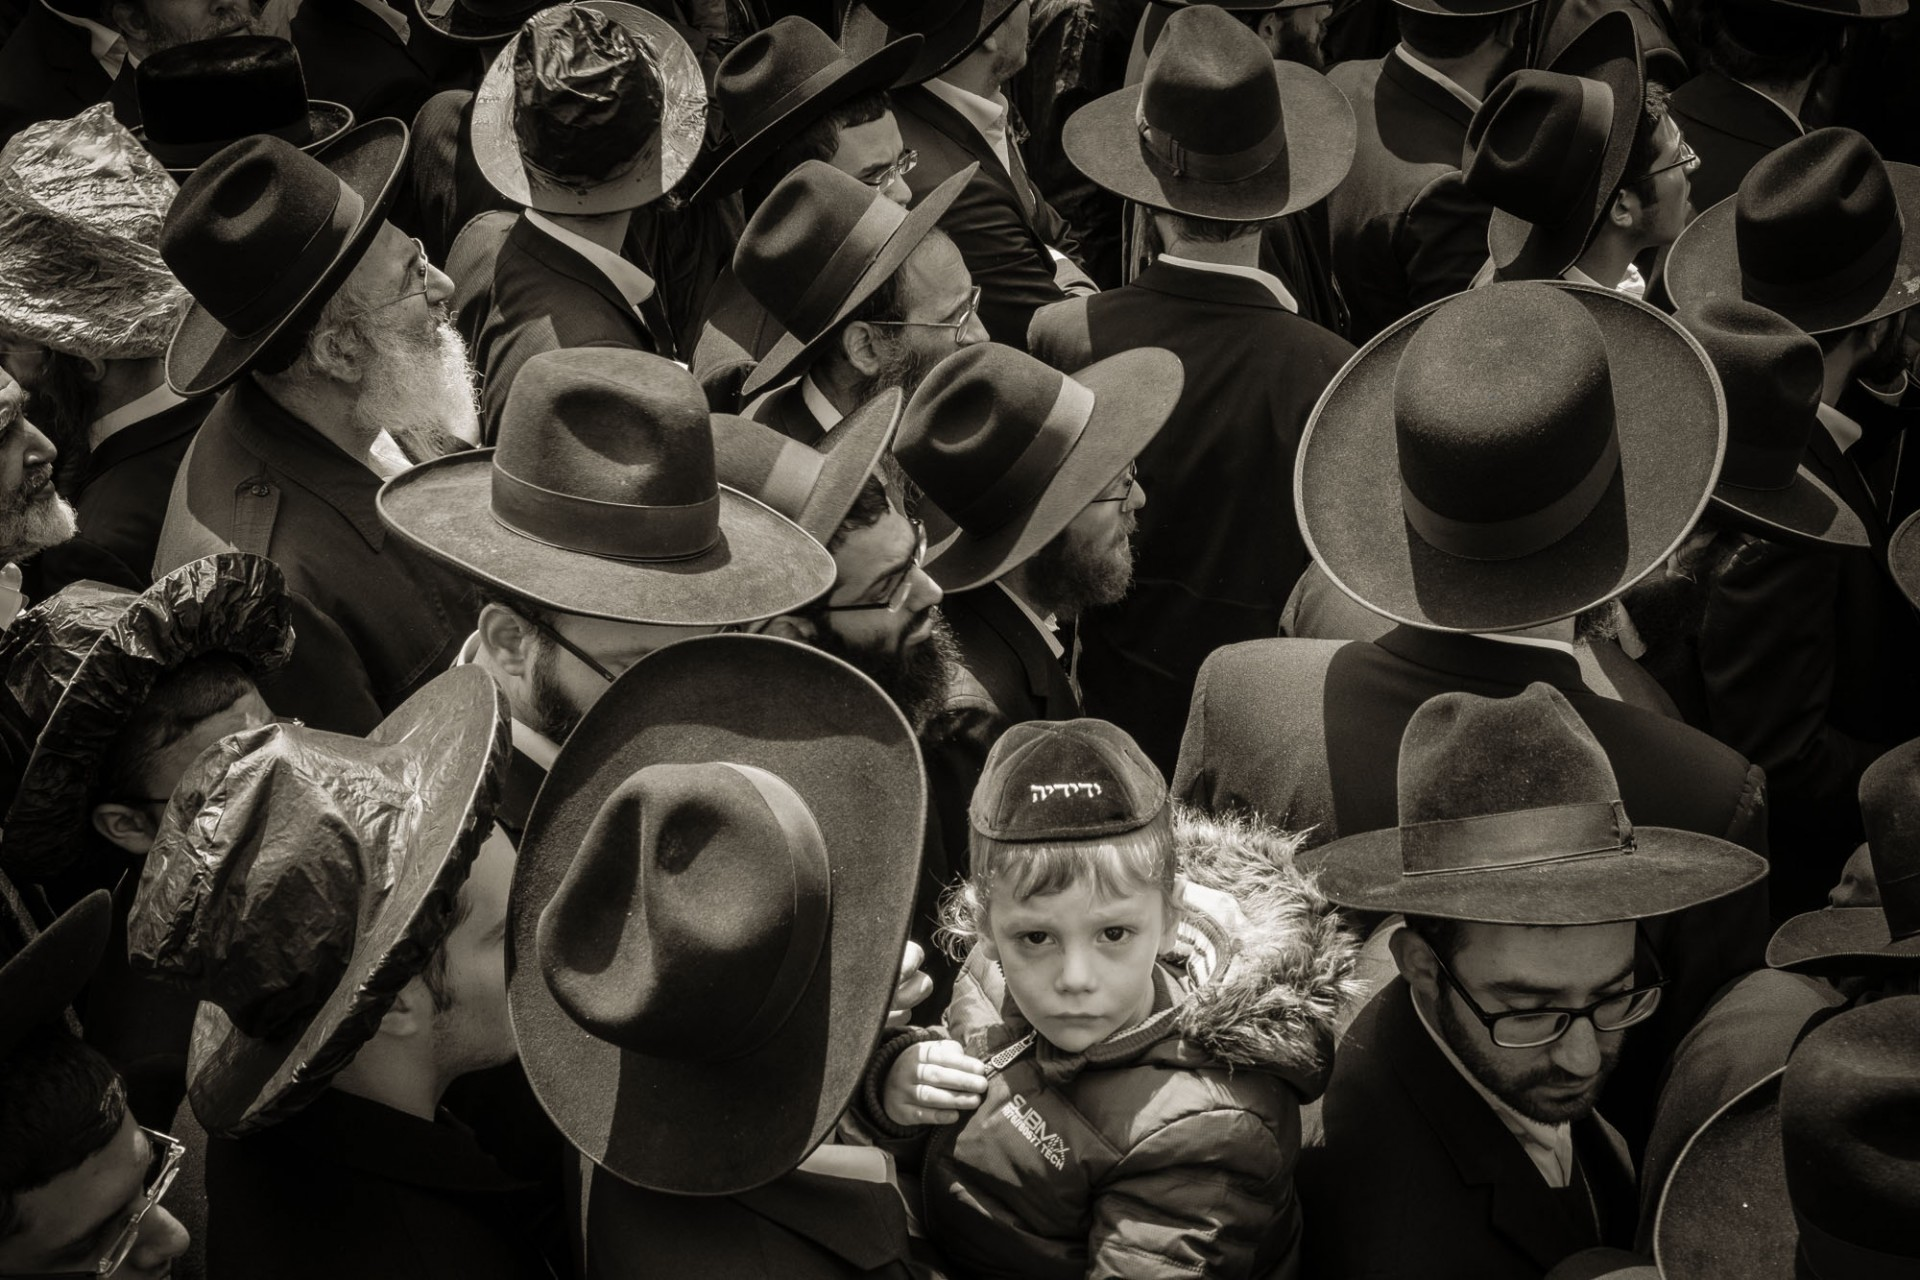 Rabbi's funeral - 2015